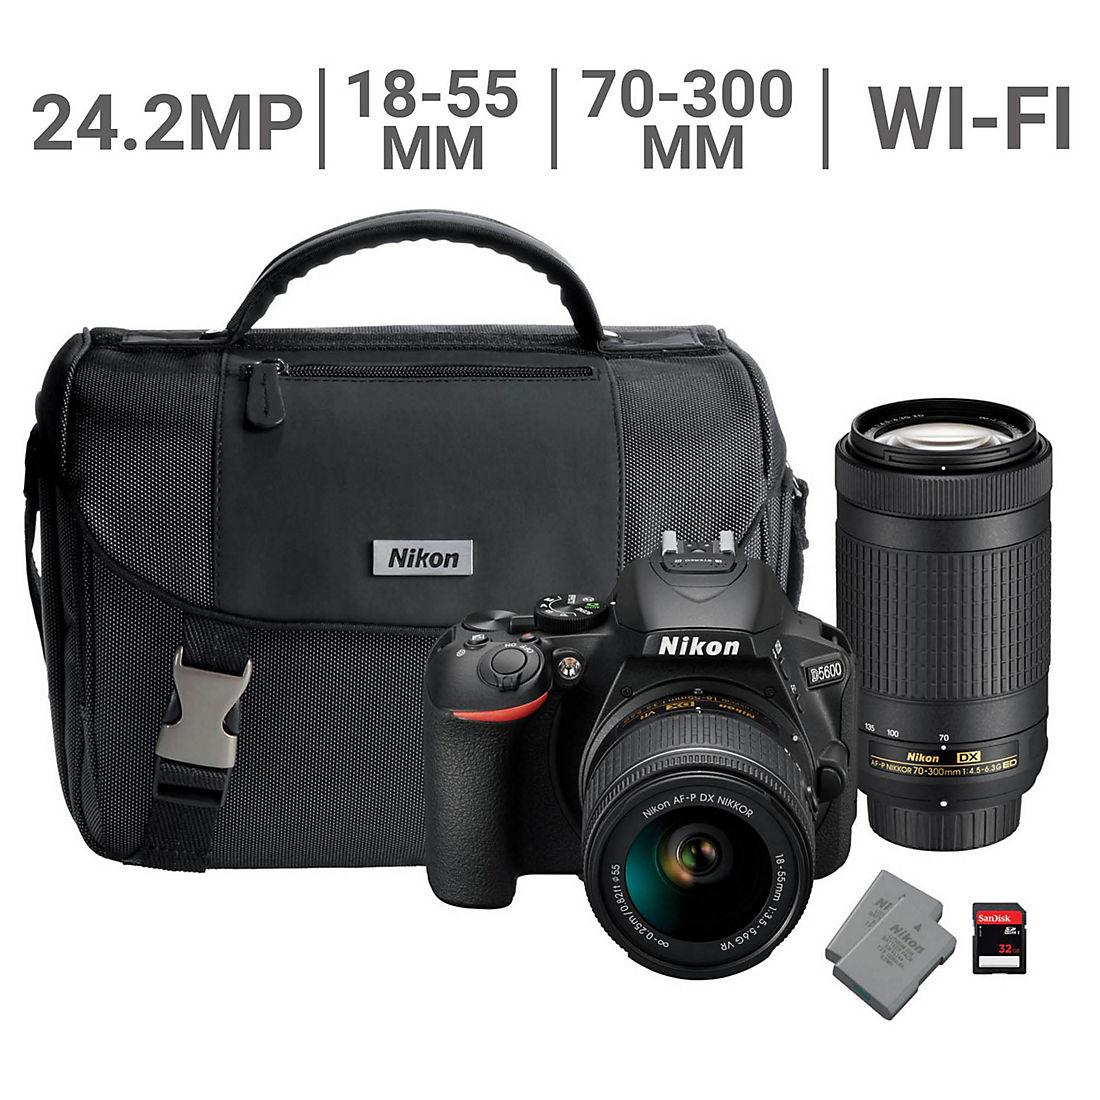 Nikon D5600 24 2MP CMOS Wi-Fi DSLR Camera with 18-55mm VR